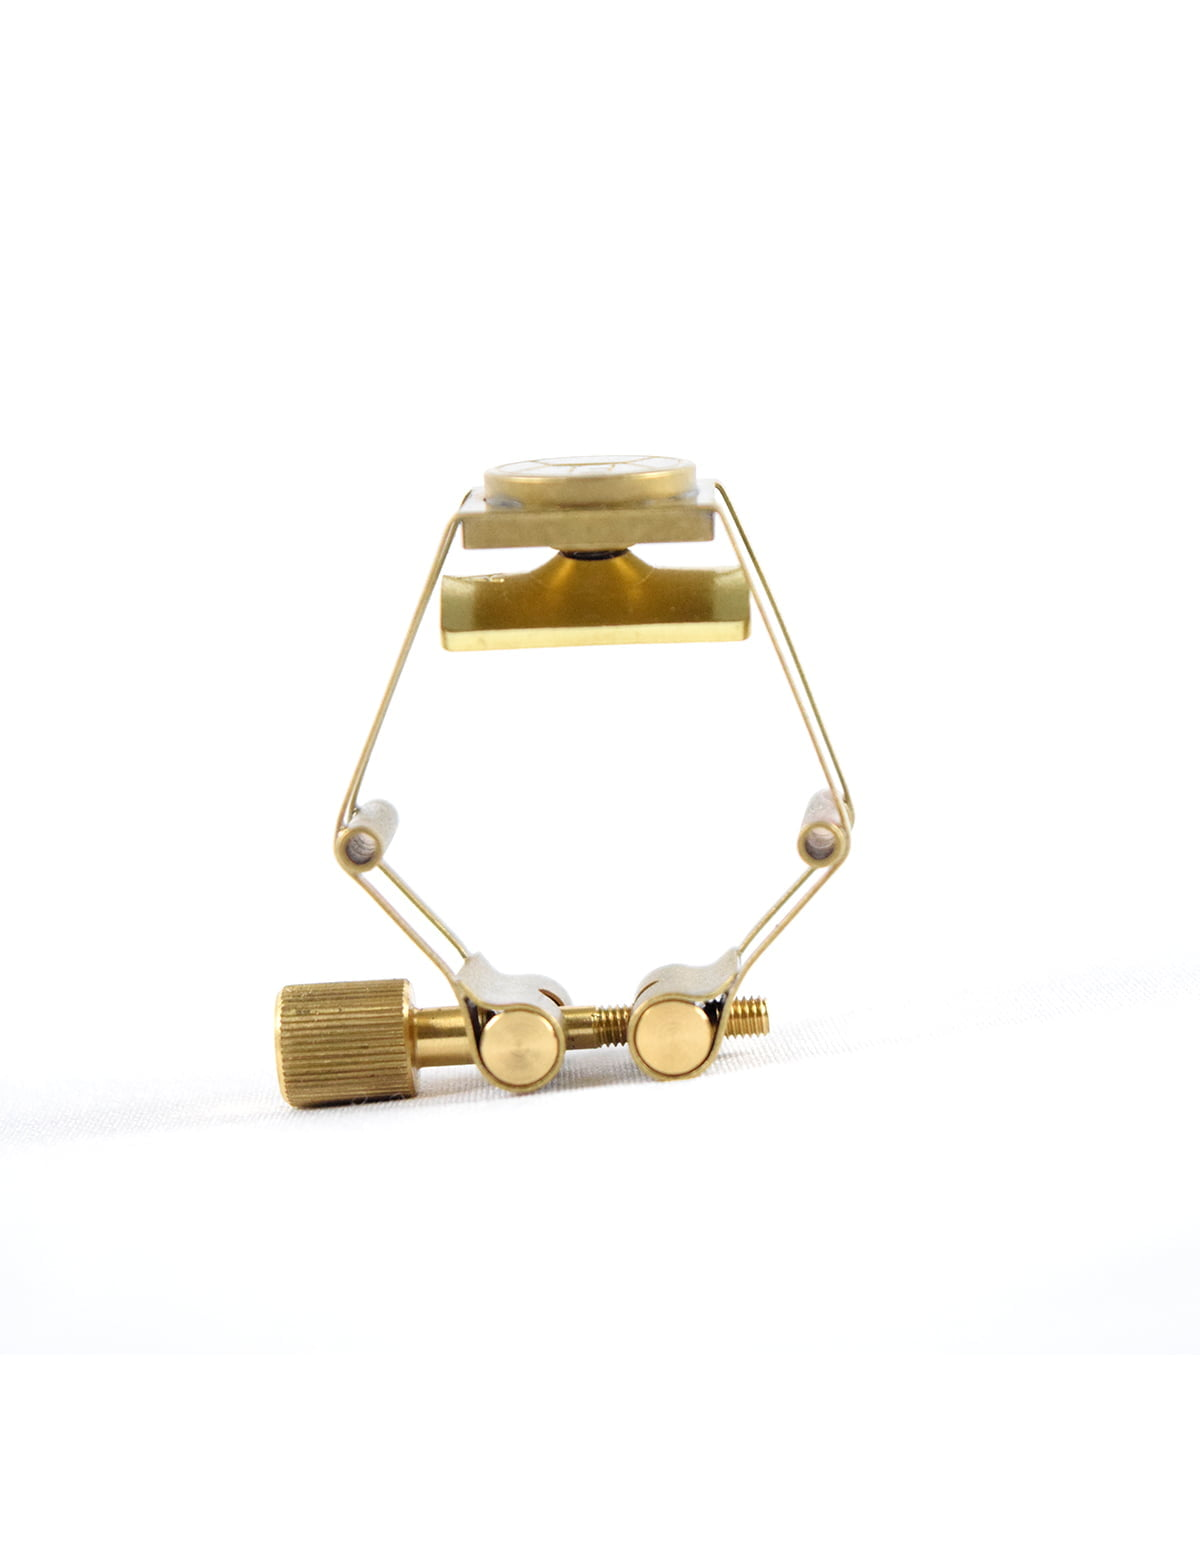 Abraçadeira François Louis Pure Brass Brass Sax Tenor